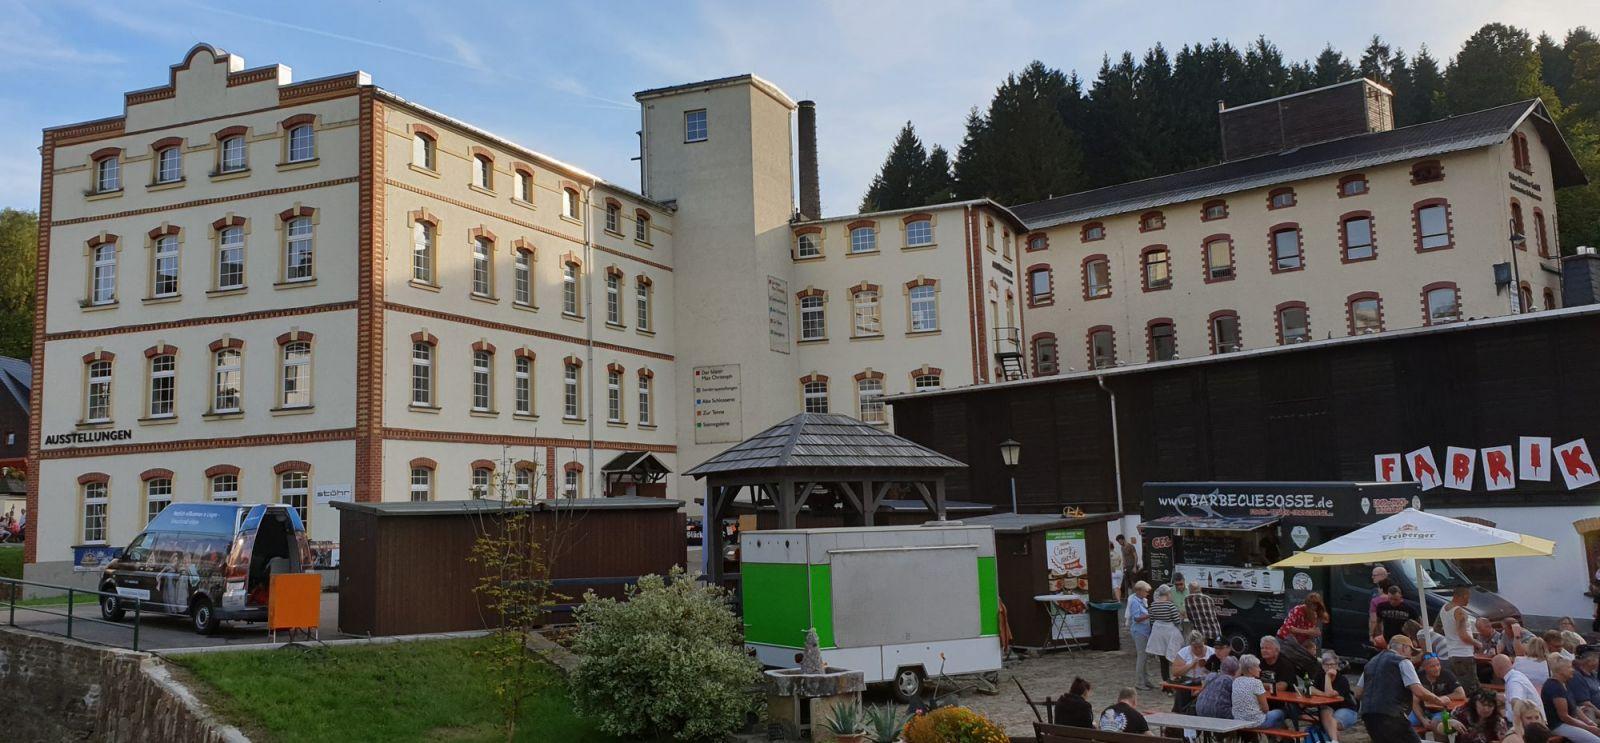 Böttcherfabrik Pobershau